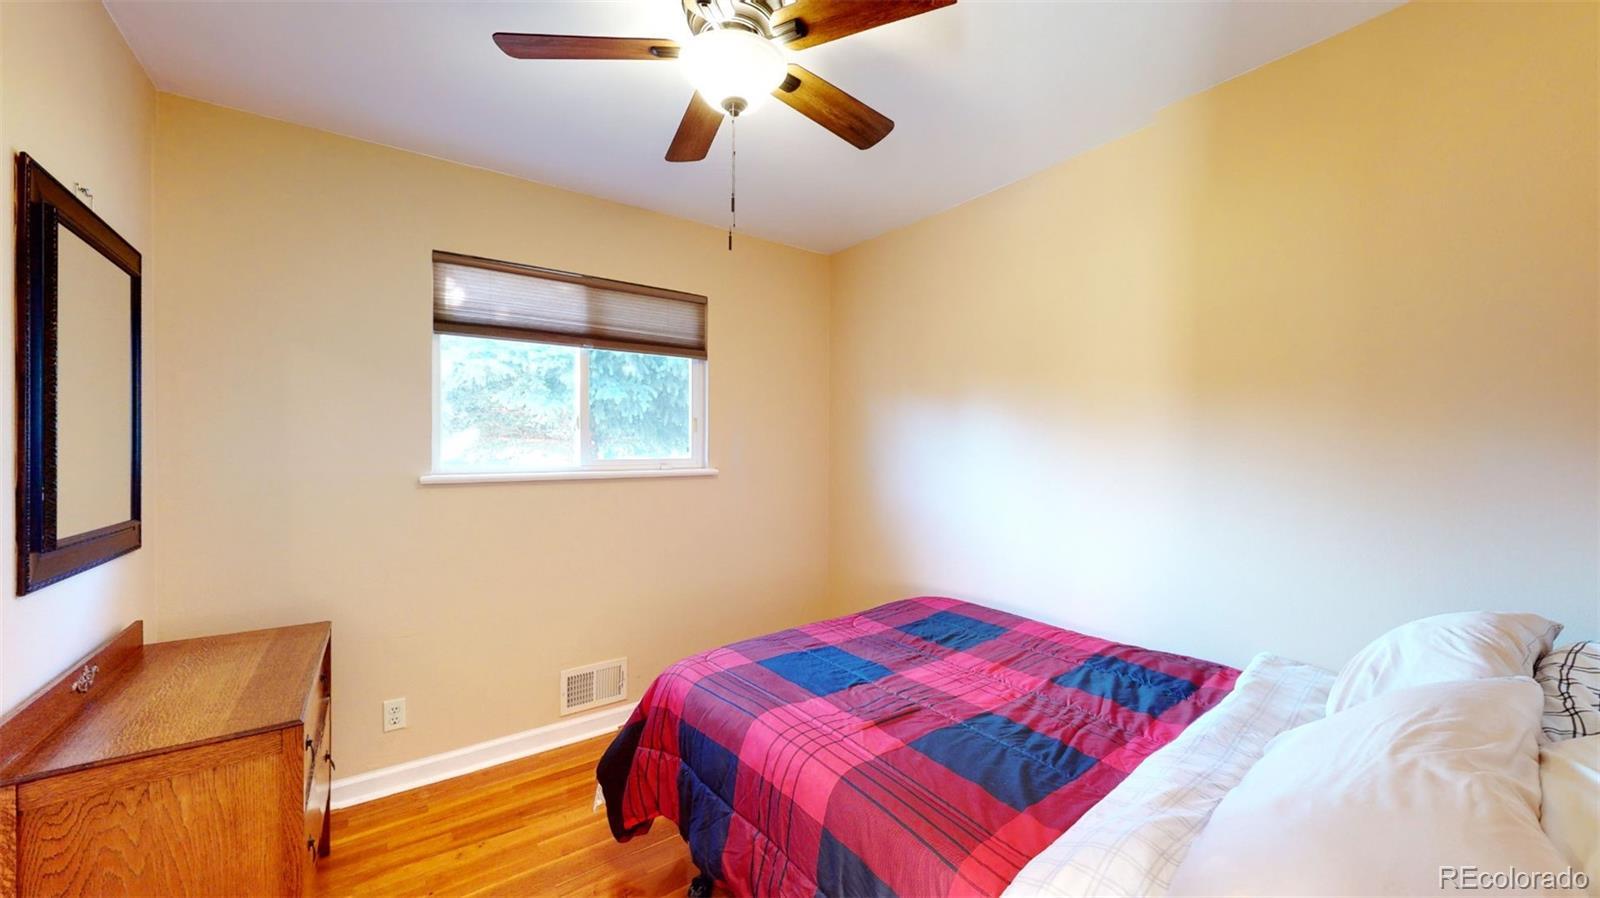 MLS# 6167151 - 22 - 1760 S Upham Street, Lakewood, CO 80232